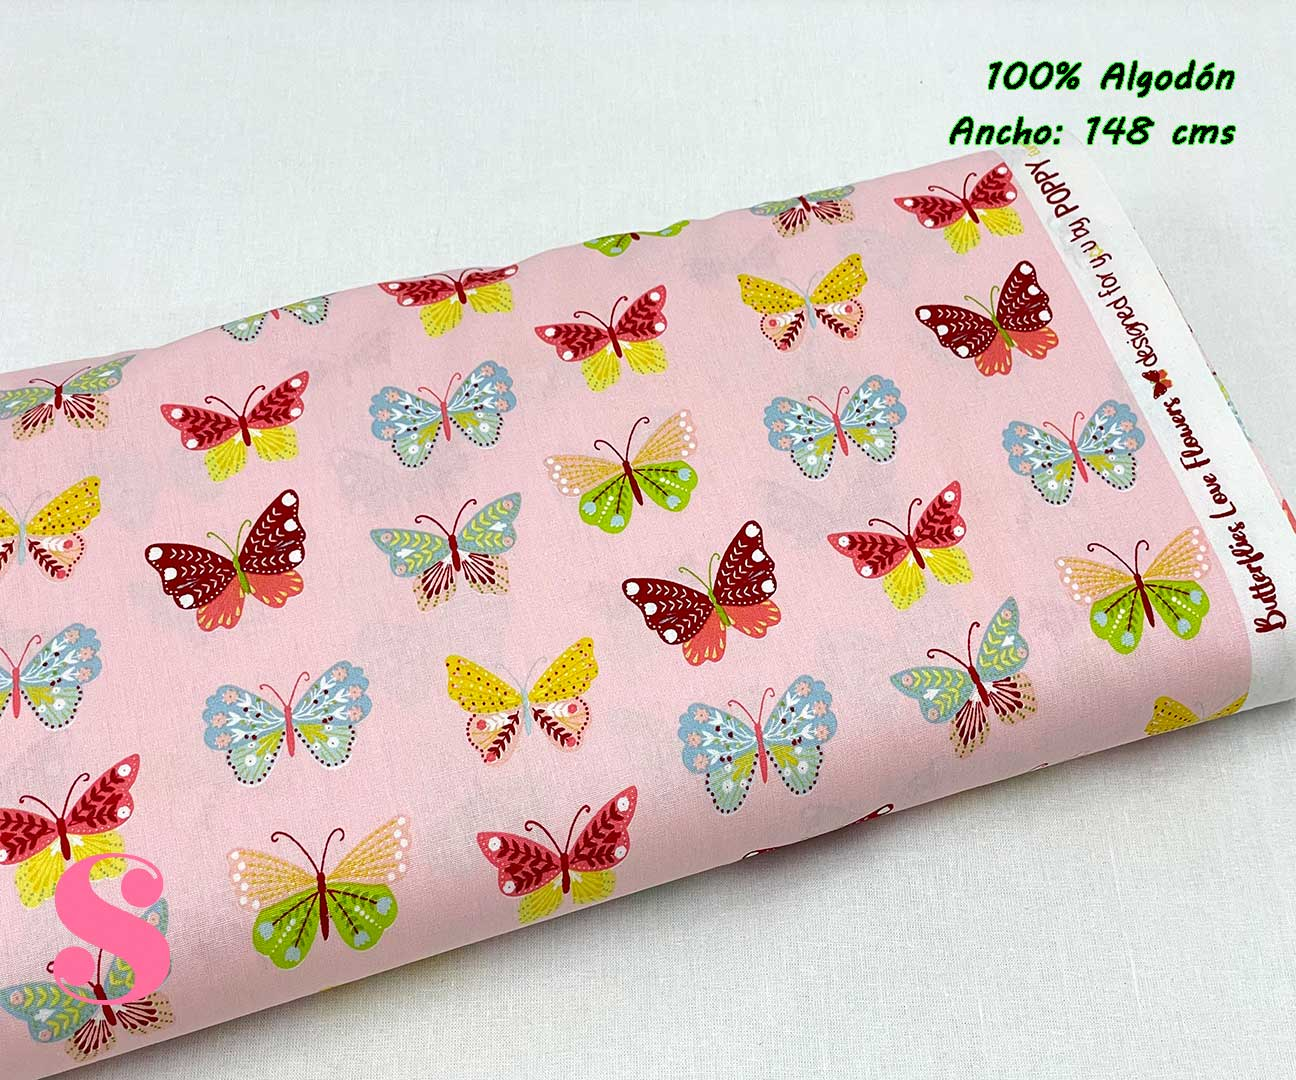 81-tela-estampada-flores,telas-dibujos-primaverales,telas-infantiles,tejidos-infantiles,Tejido Estampado Butterflys fondo Rosa,Tejido Estampado Butterflys fondo Menta